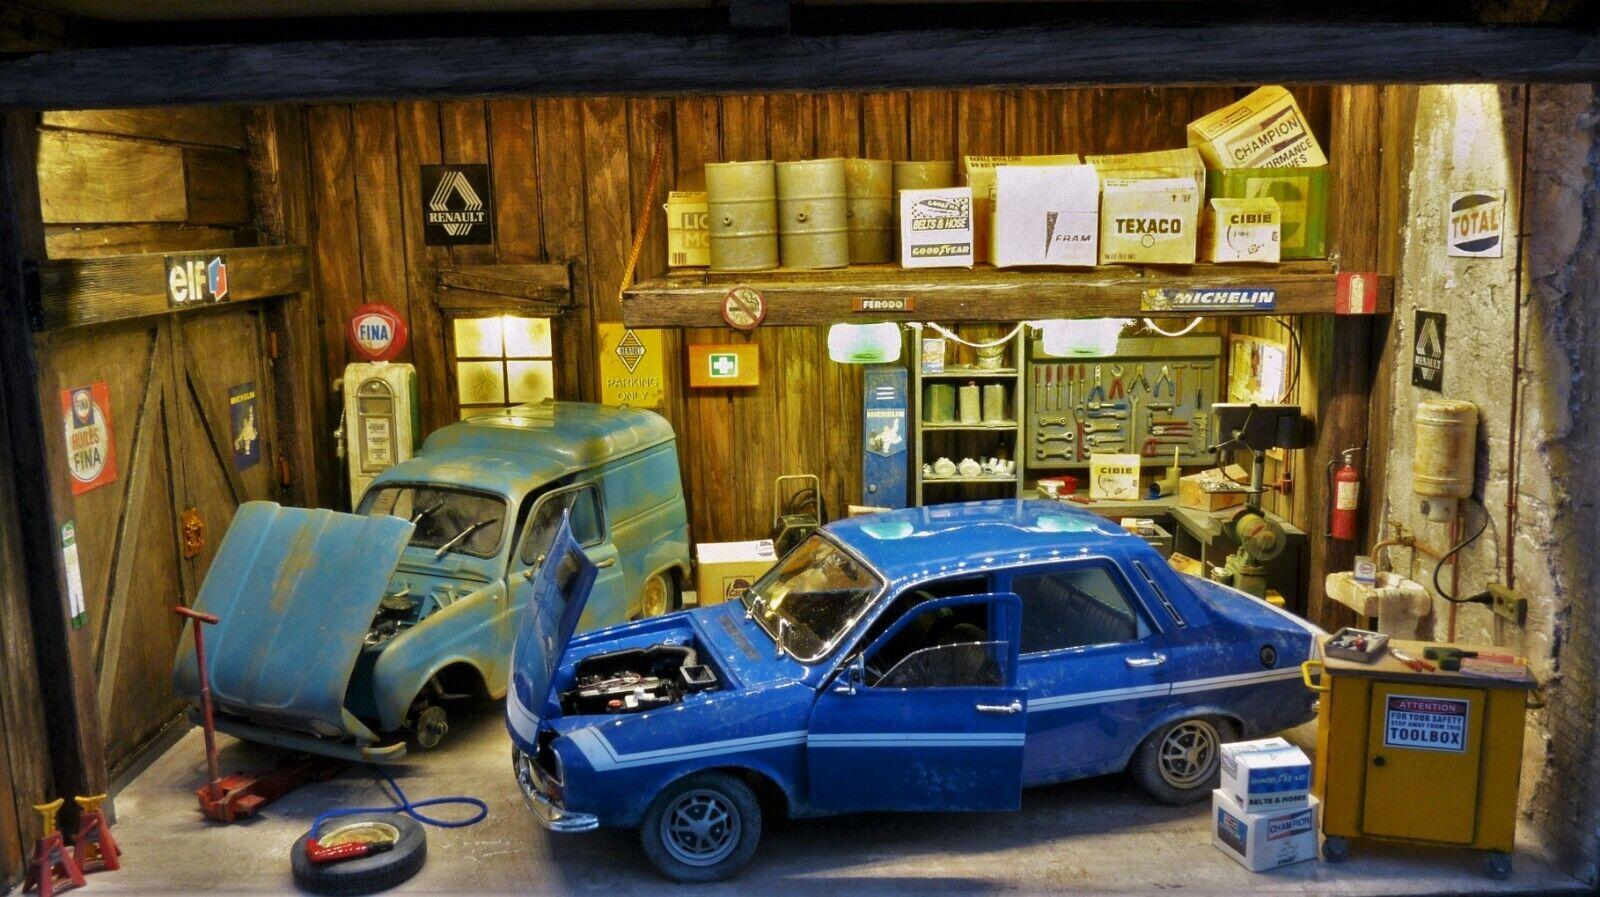 QHC Diorama 1 18 Vintage European lavoronegozio with 2 Renault modellolos